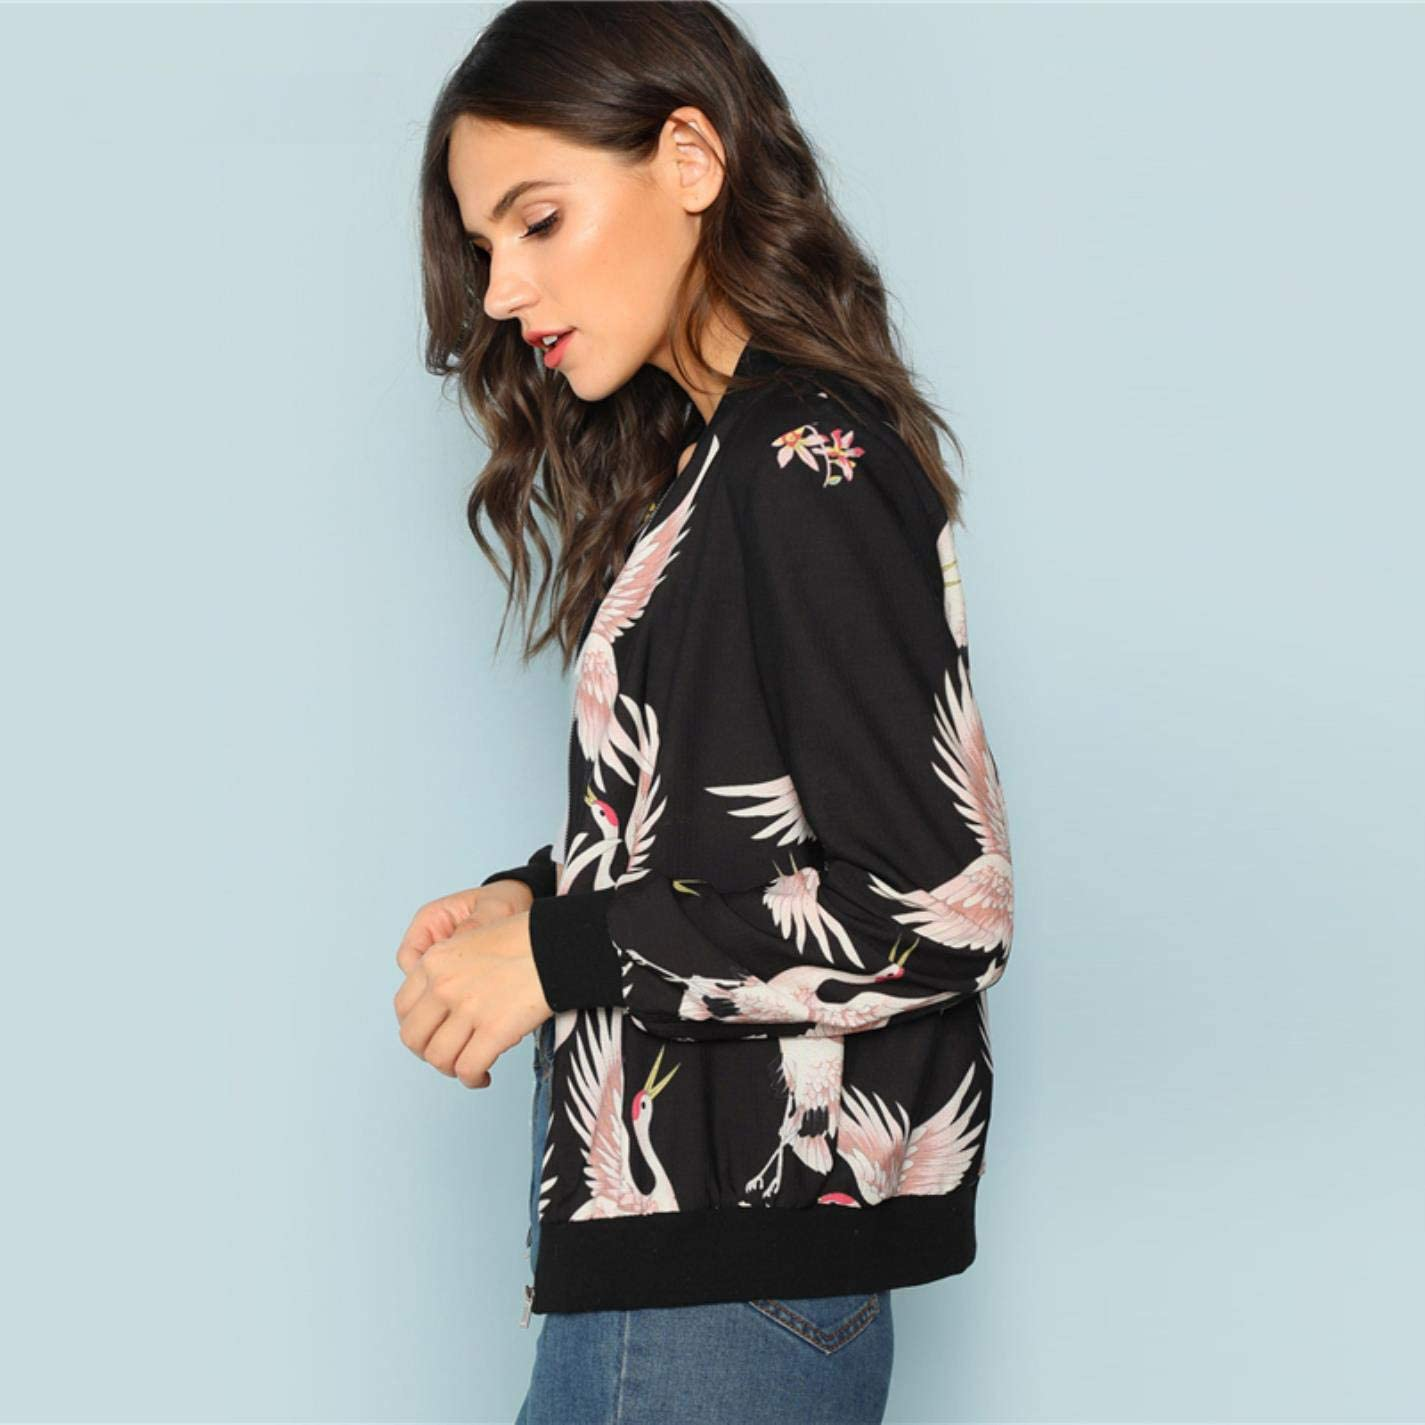 Black Flamingo Print Zip Up Jacket Casual Streetwear Animal Bomber